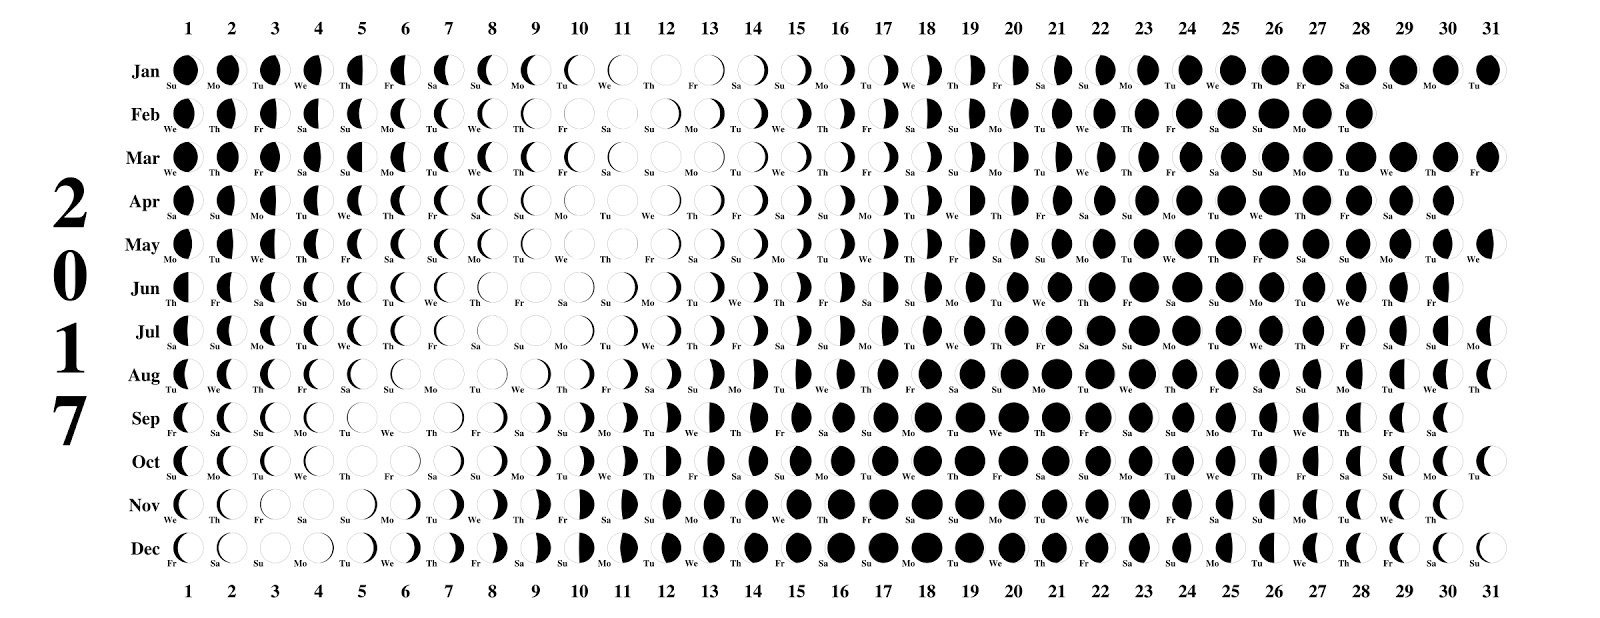 Full moon Calendar 2016 [Moon Schedule], Moon Phases Calendar 2017 ...